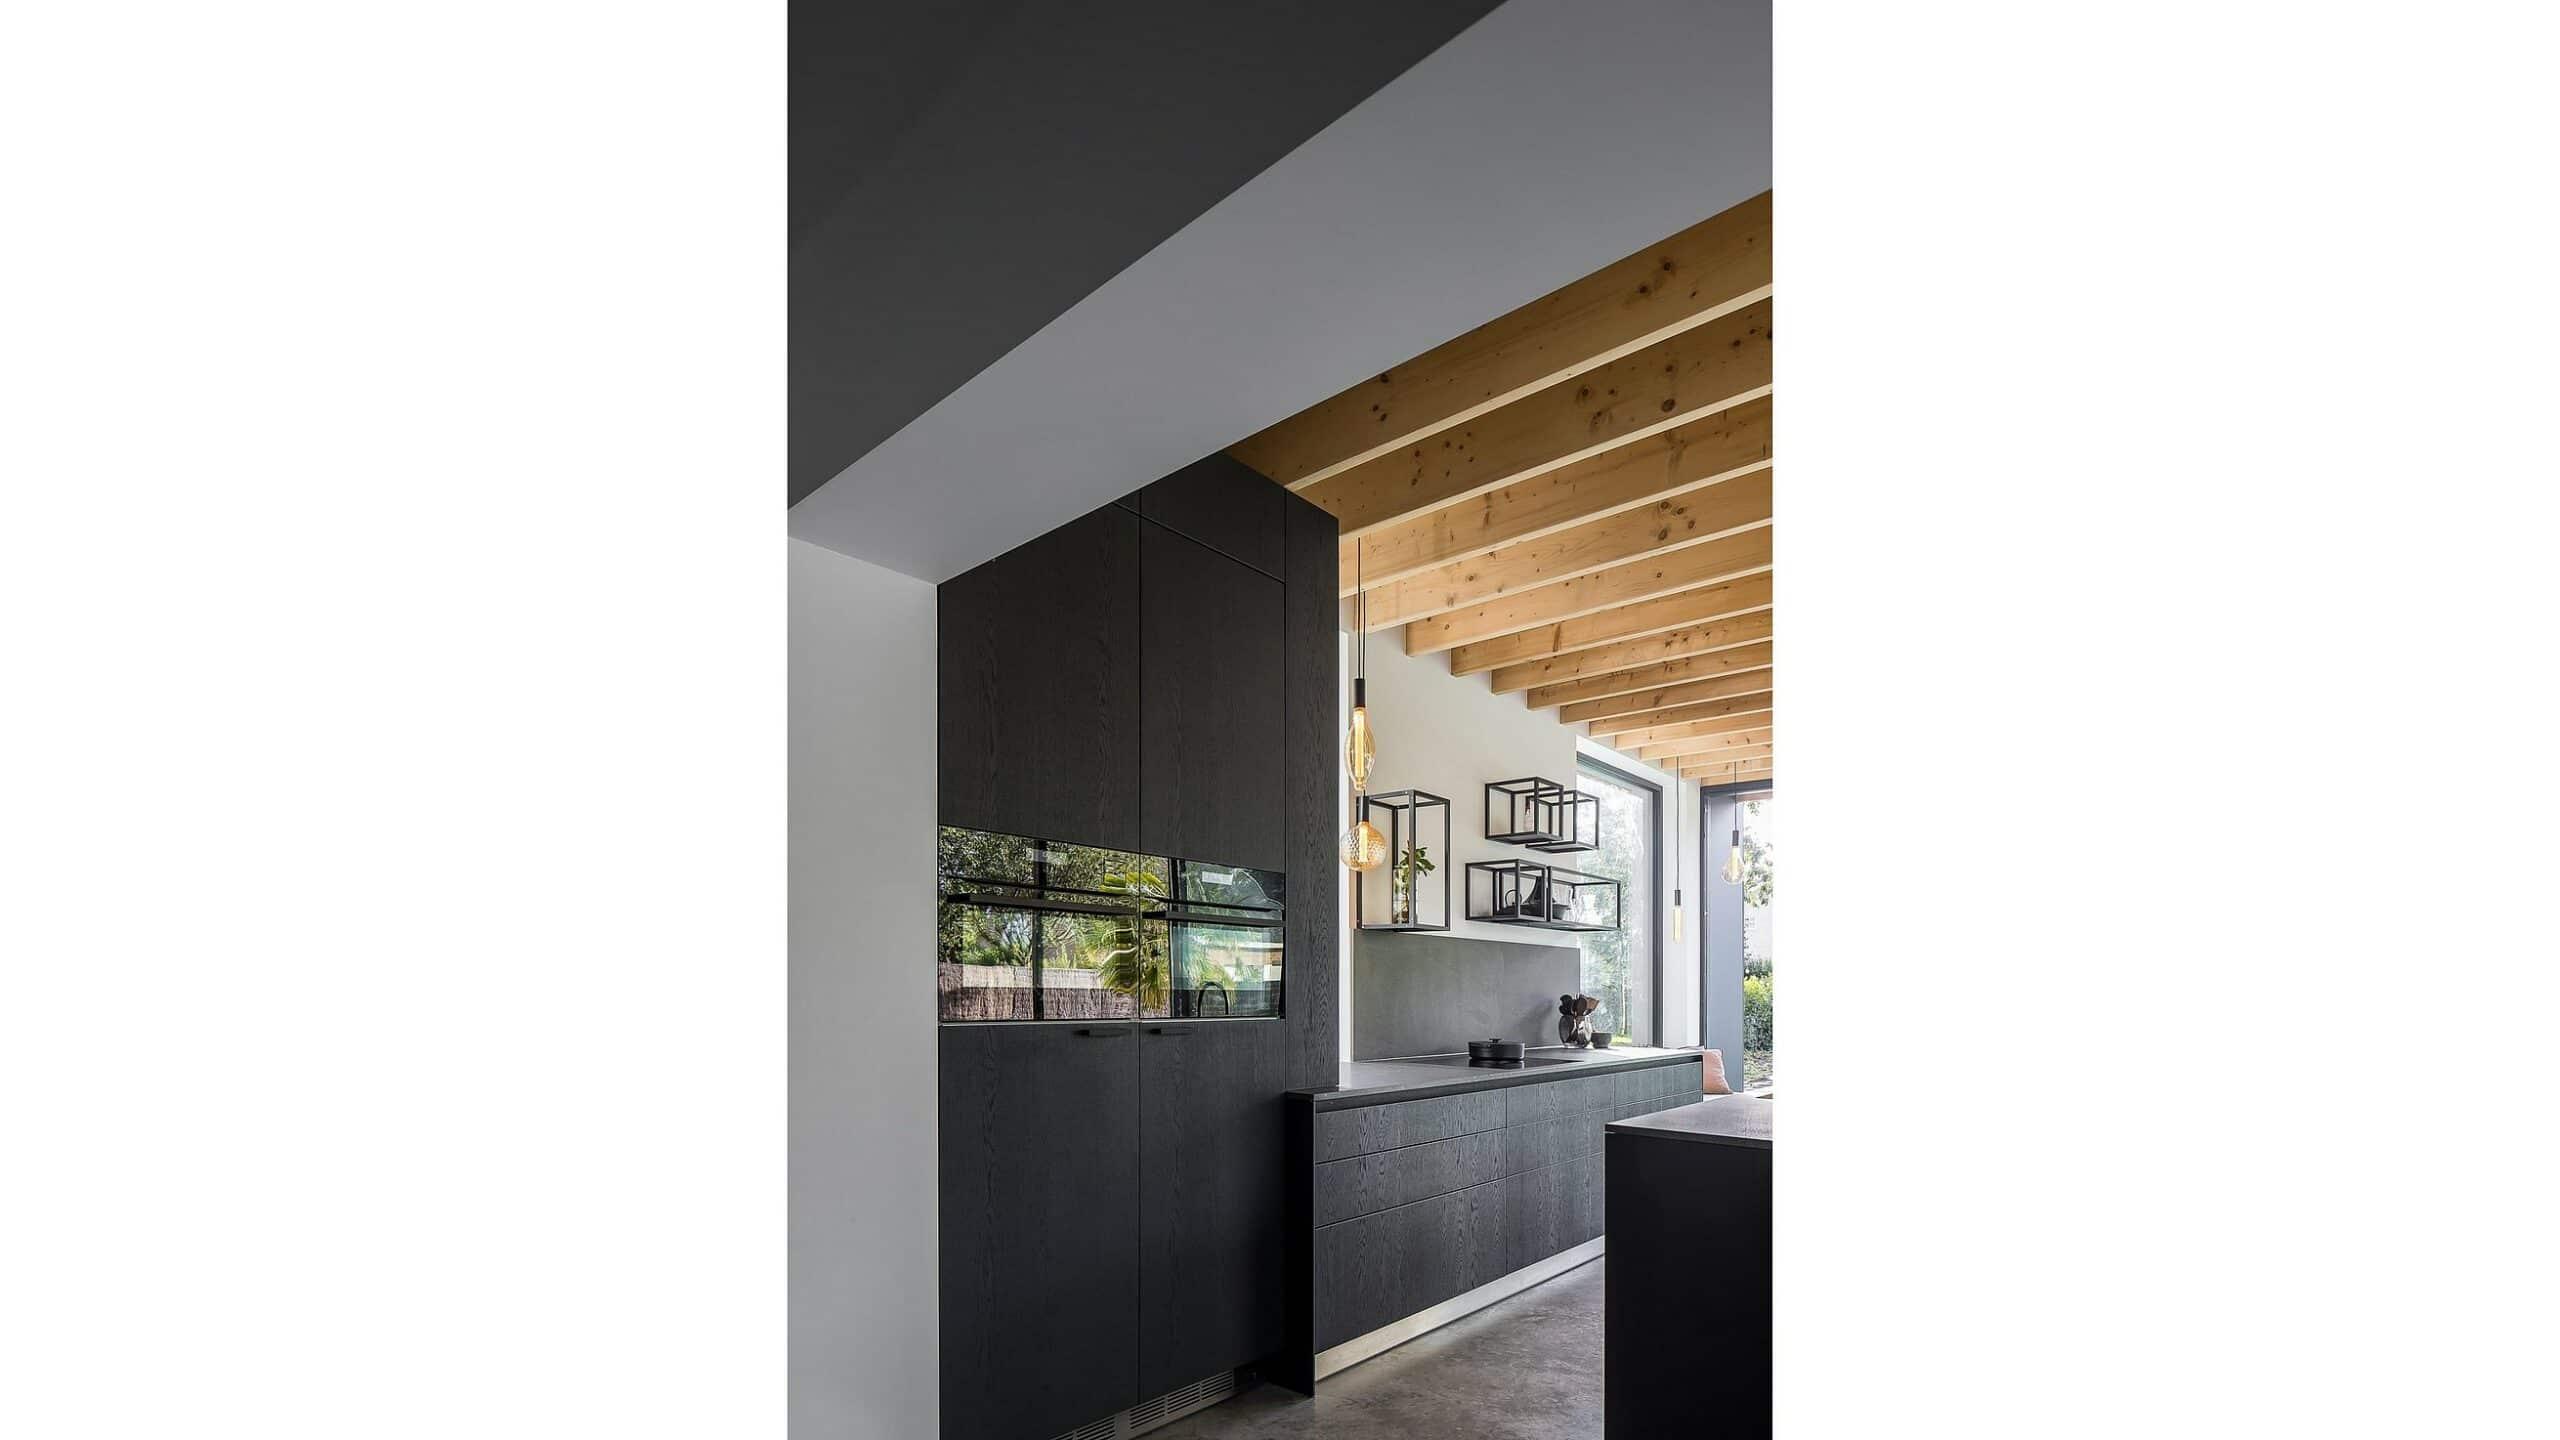 csm bulthaup ligna recta cafeine black oak 07 0e1f4ce219 1 scaled | Baeyens & Beck architecten Gent | architect nieuwbouw renovatie interieur | high end | architectenbureau